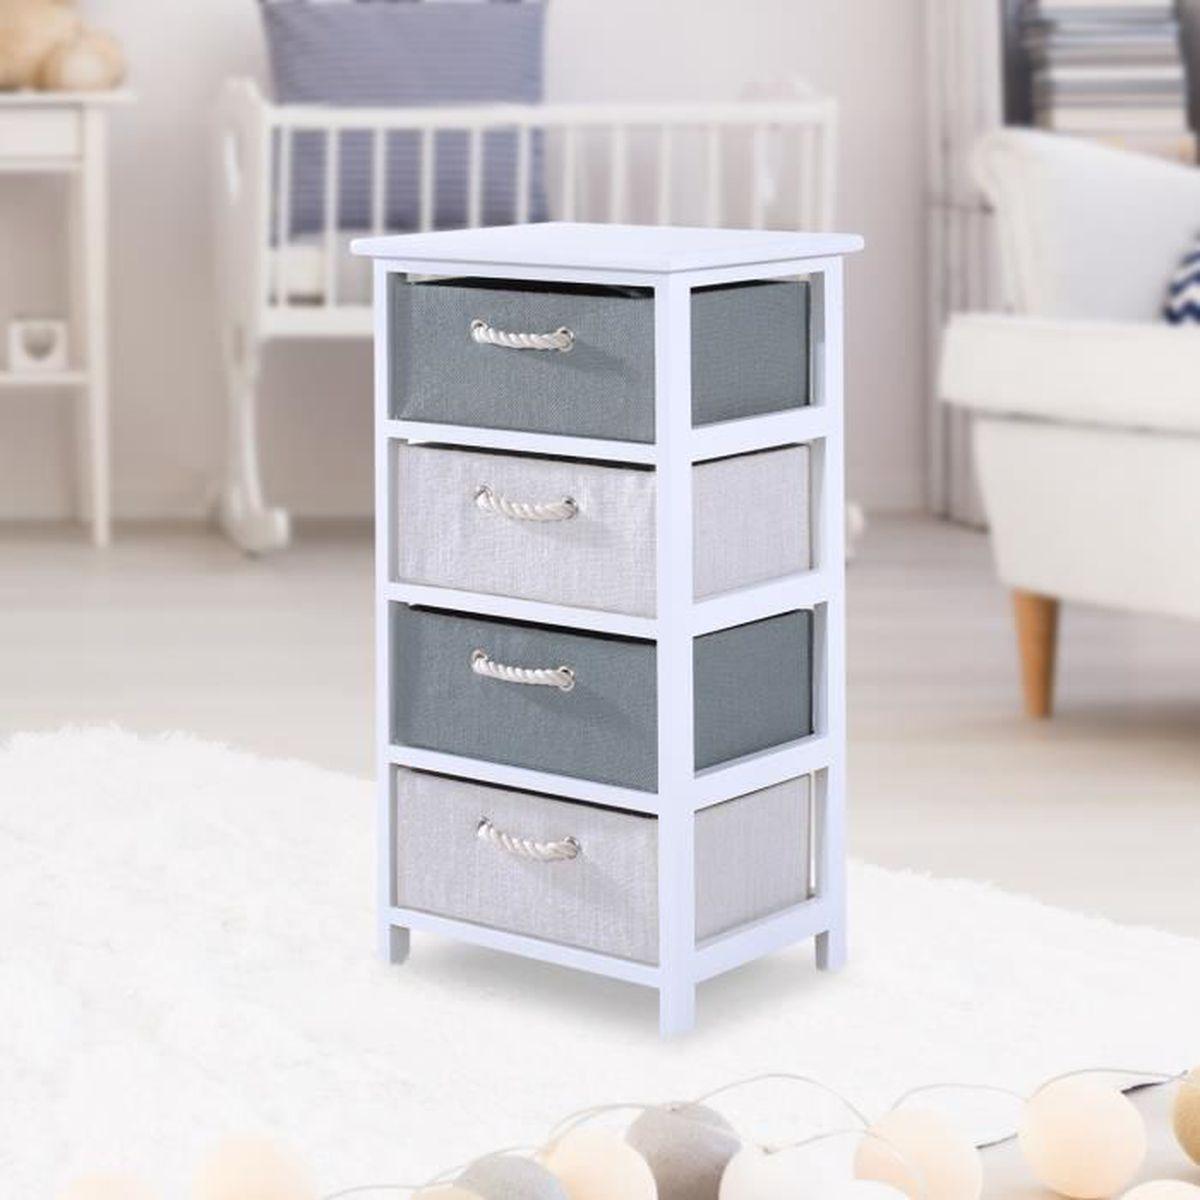 chiffonnier commode bois de paulownia 4 tiroirs toile de. Black Bedroom Furniture Sets. Home Design Ideas